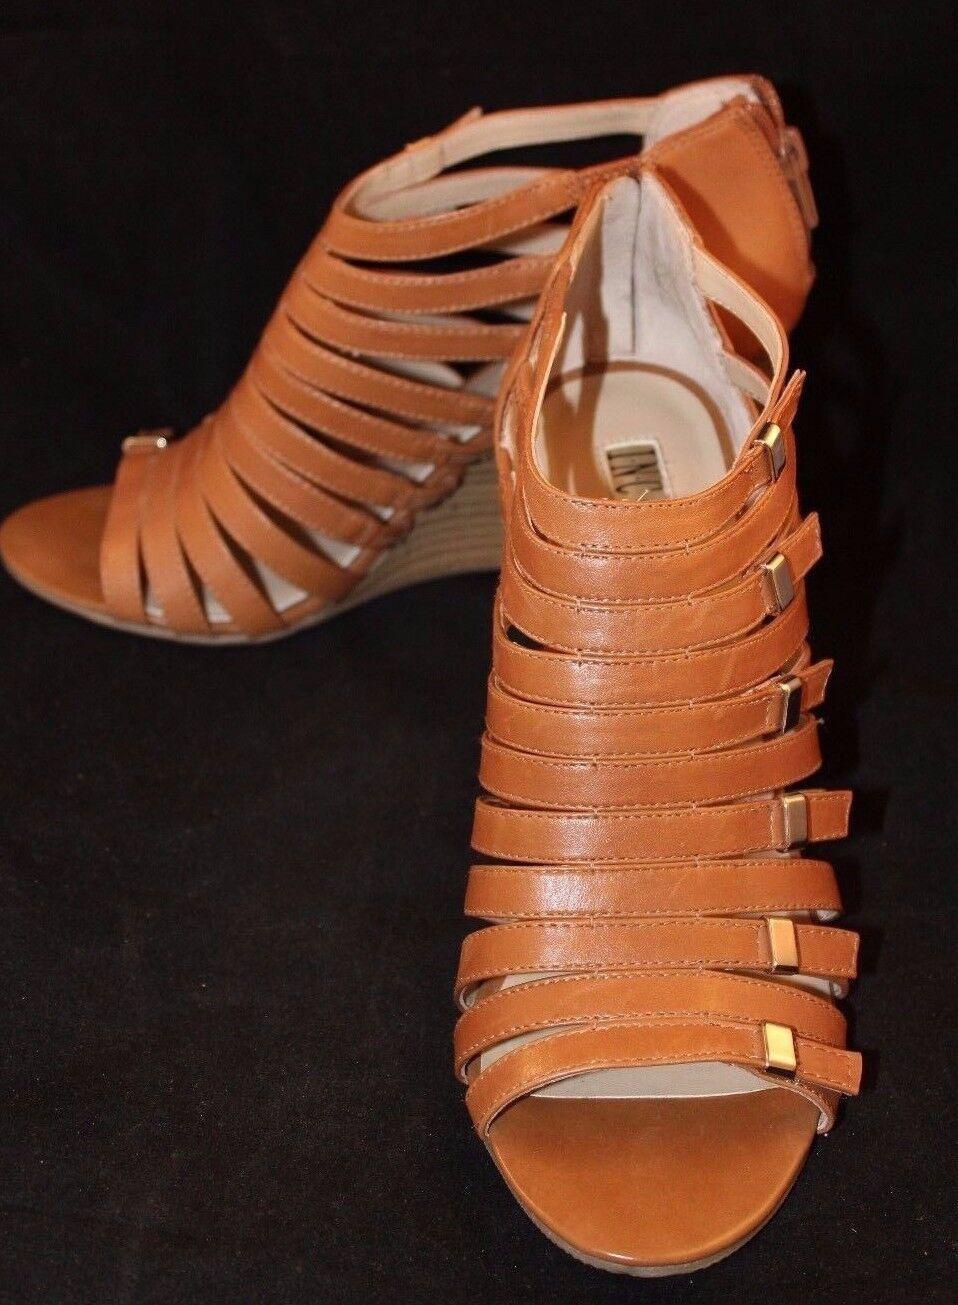 Inc International Concepts Mujer Mujer Mujer Dionne Marrón Tostado Cuña Sandalia Zapatos Talla 8 M  muy popular